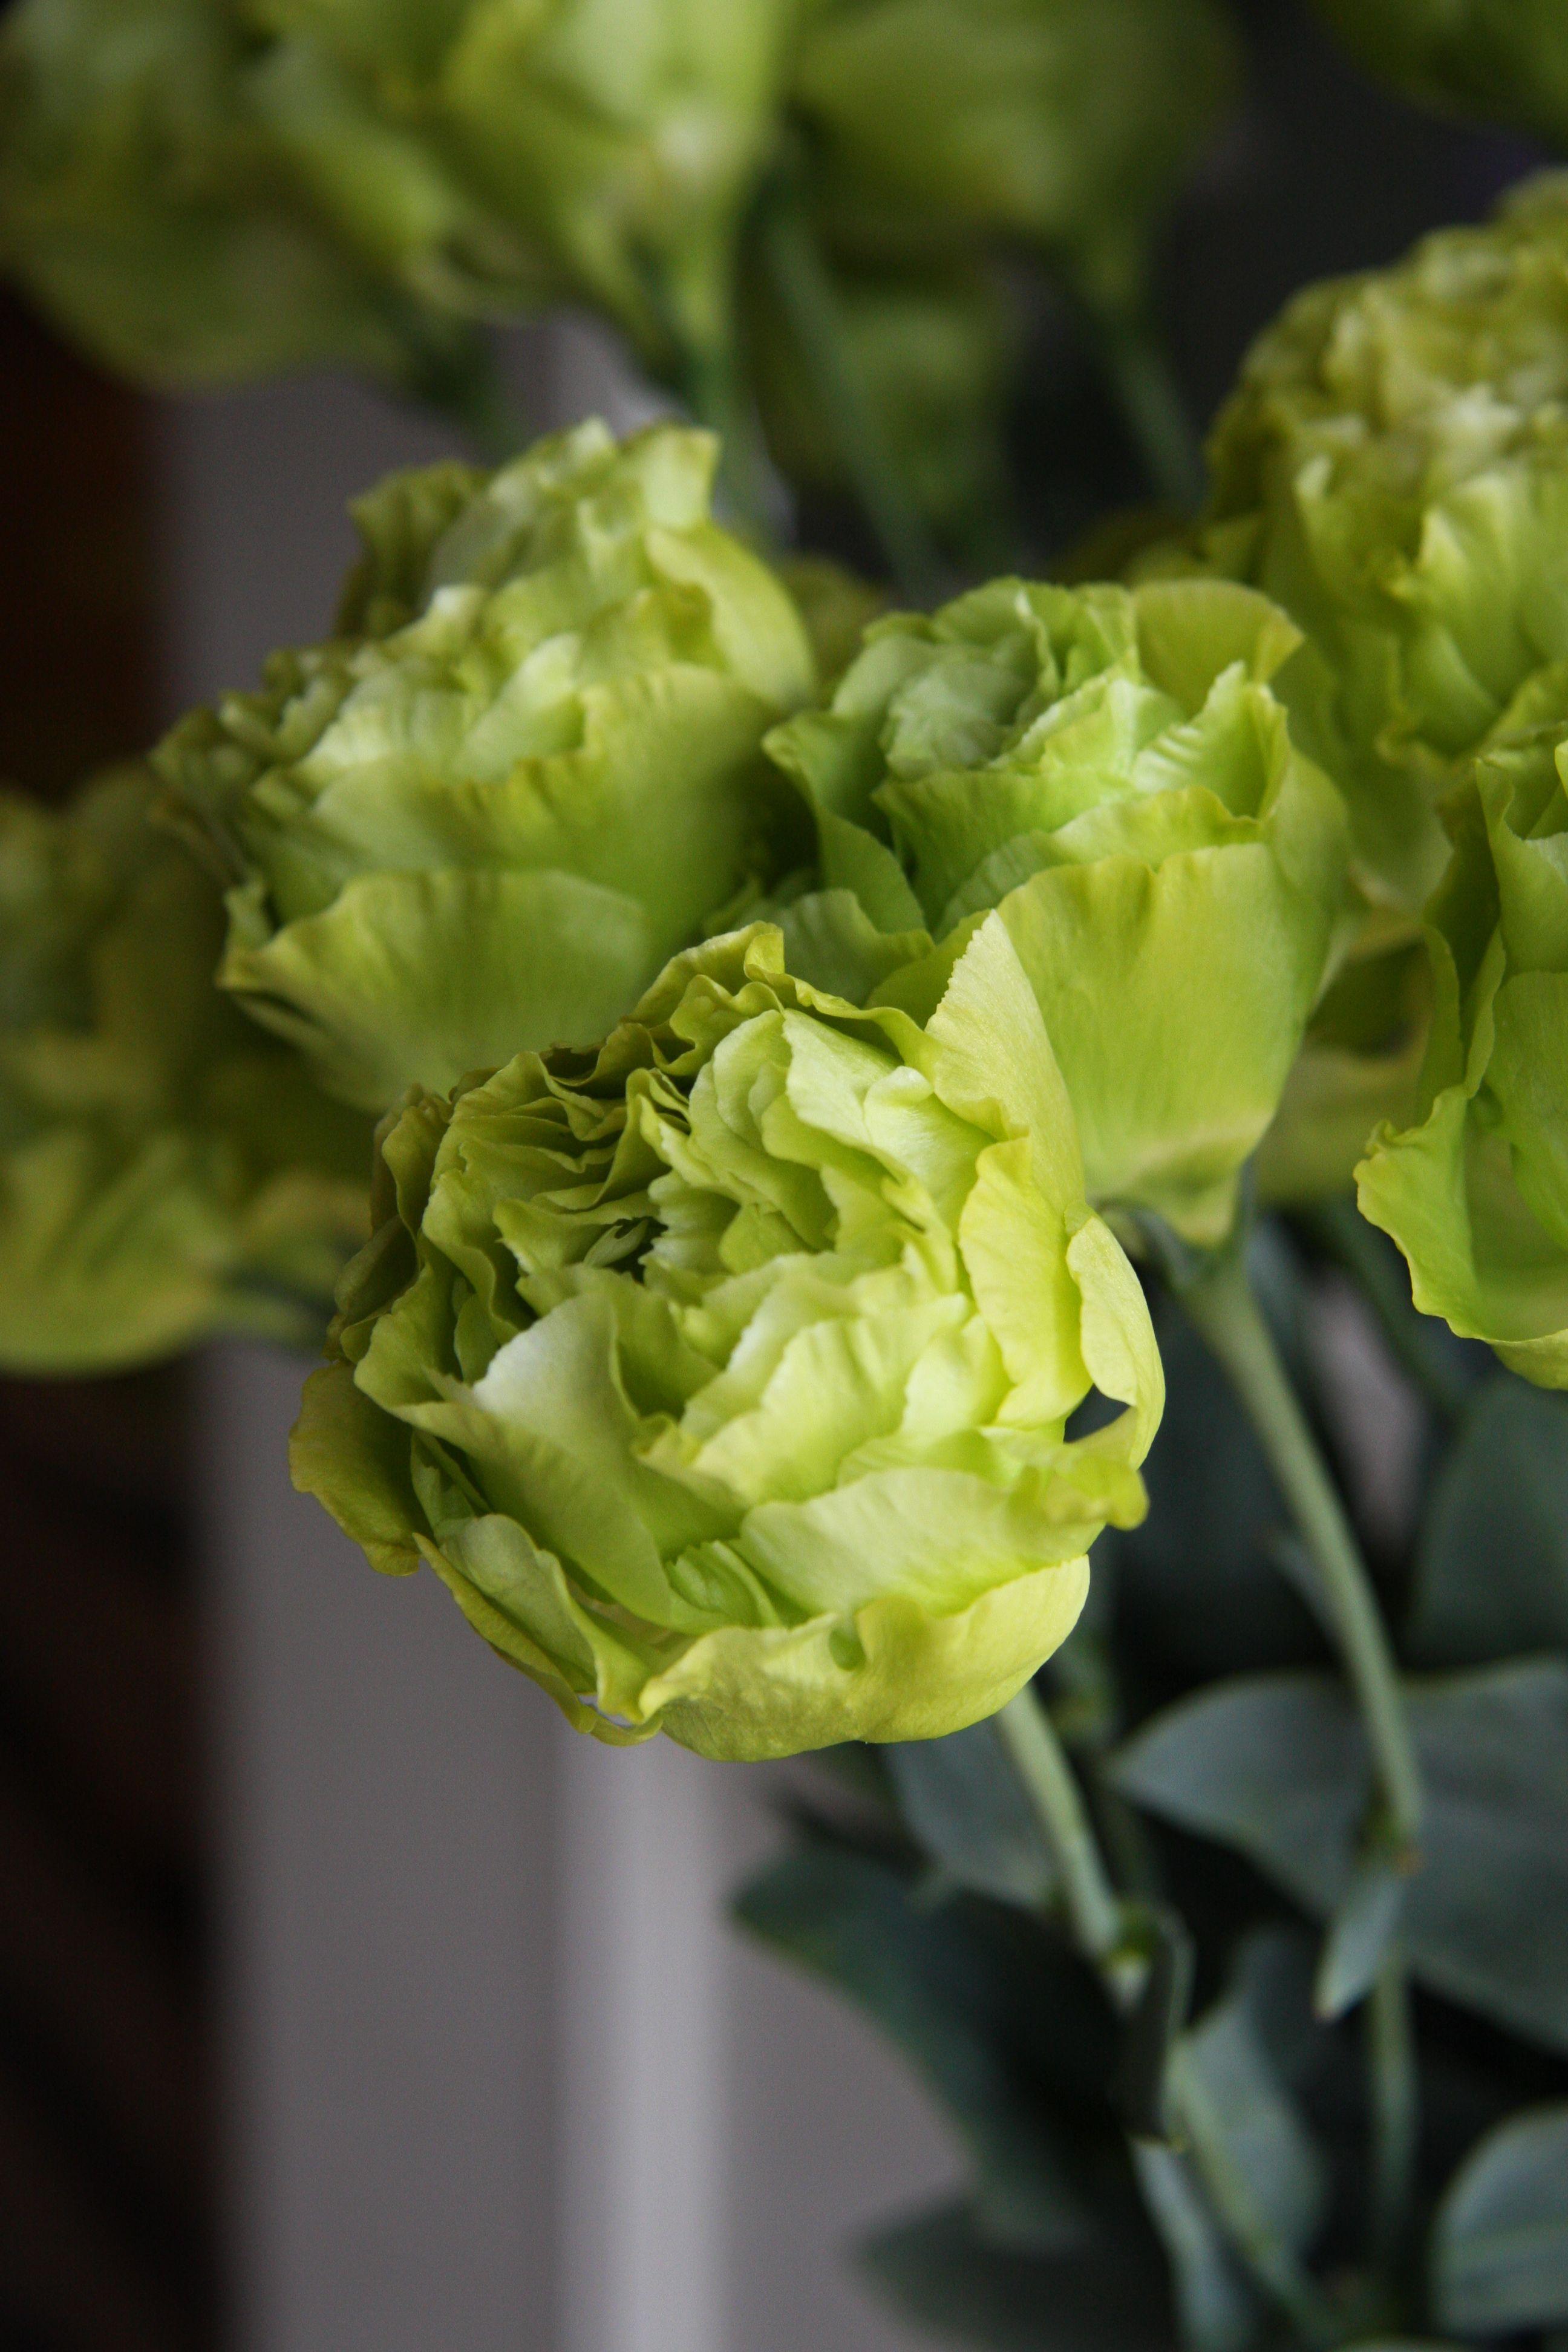 green lisianthus 39 matcha parfait 39 wedding green flowers pinterest flowers and gardens. Black Bedroom Furniture Sets. Home Design Ideas